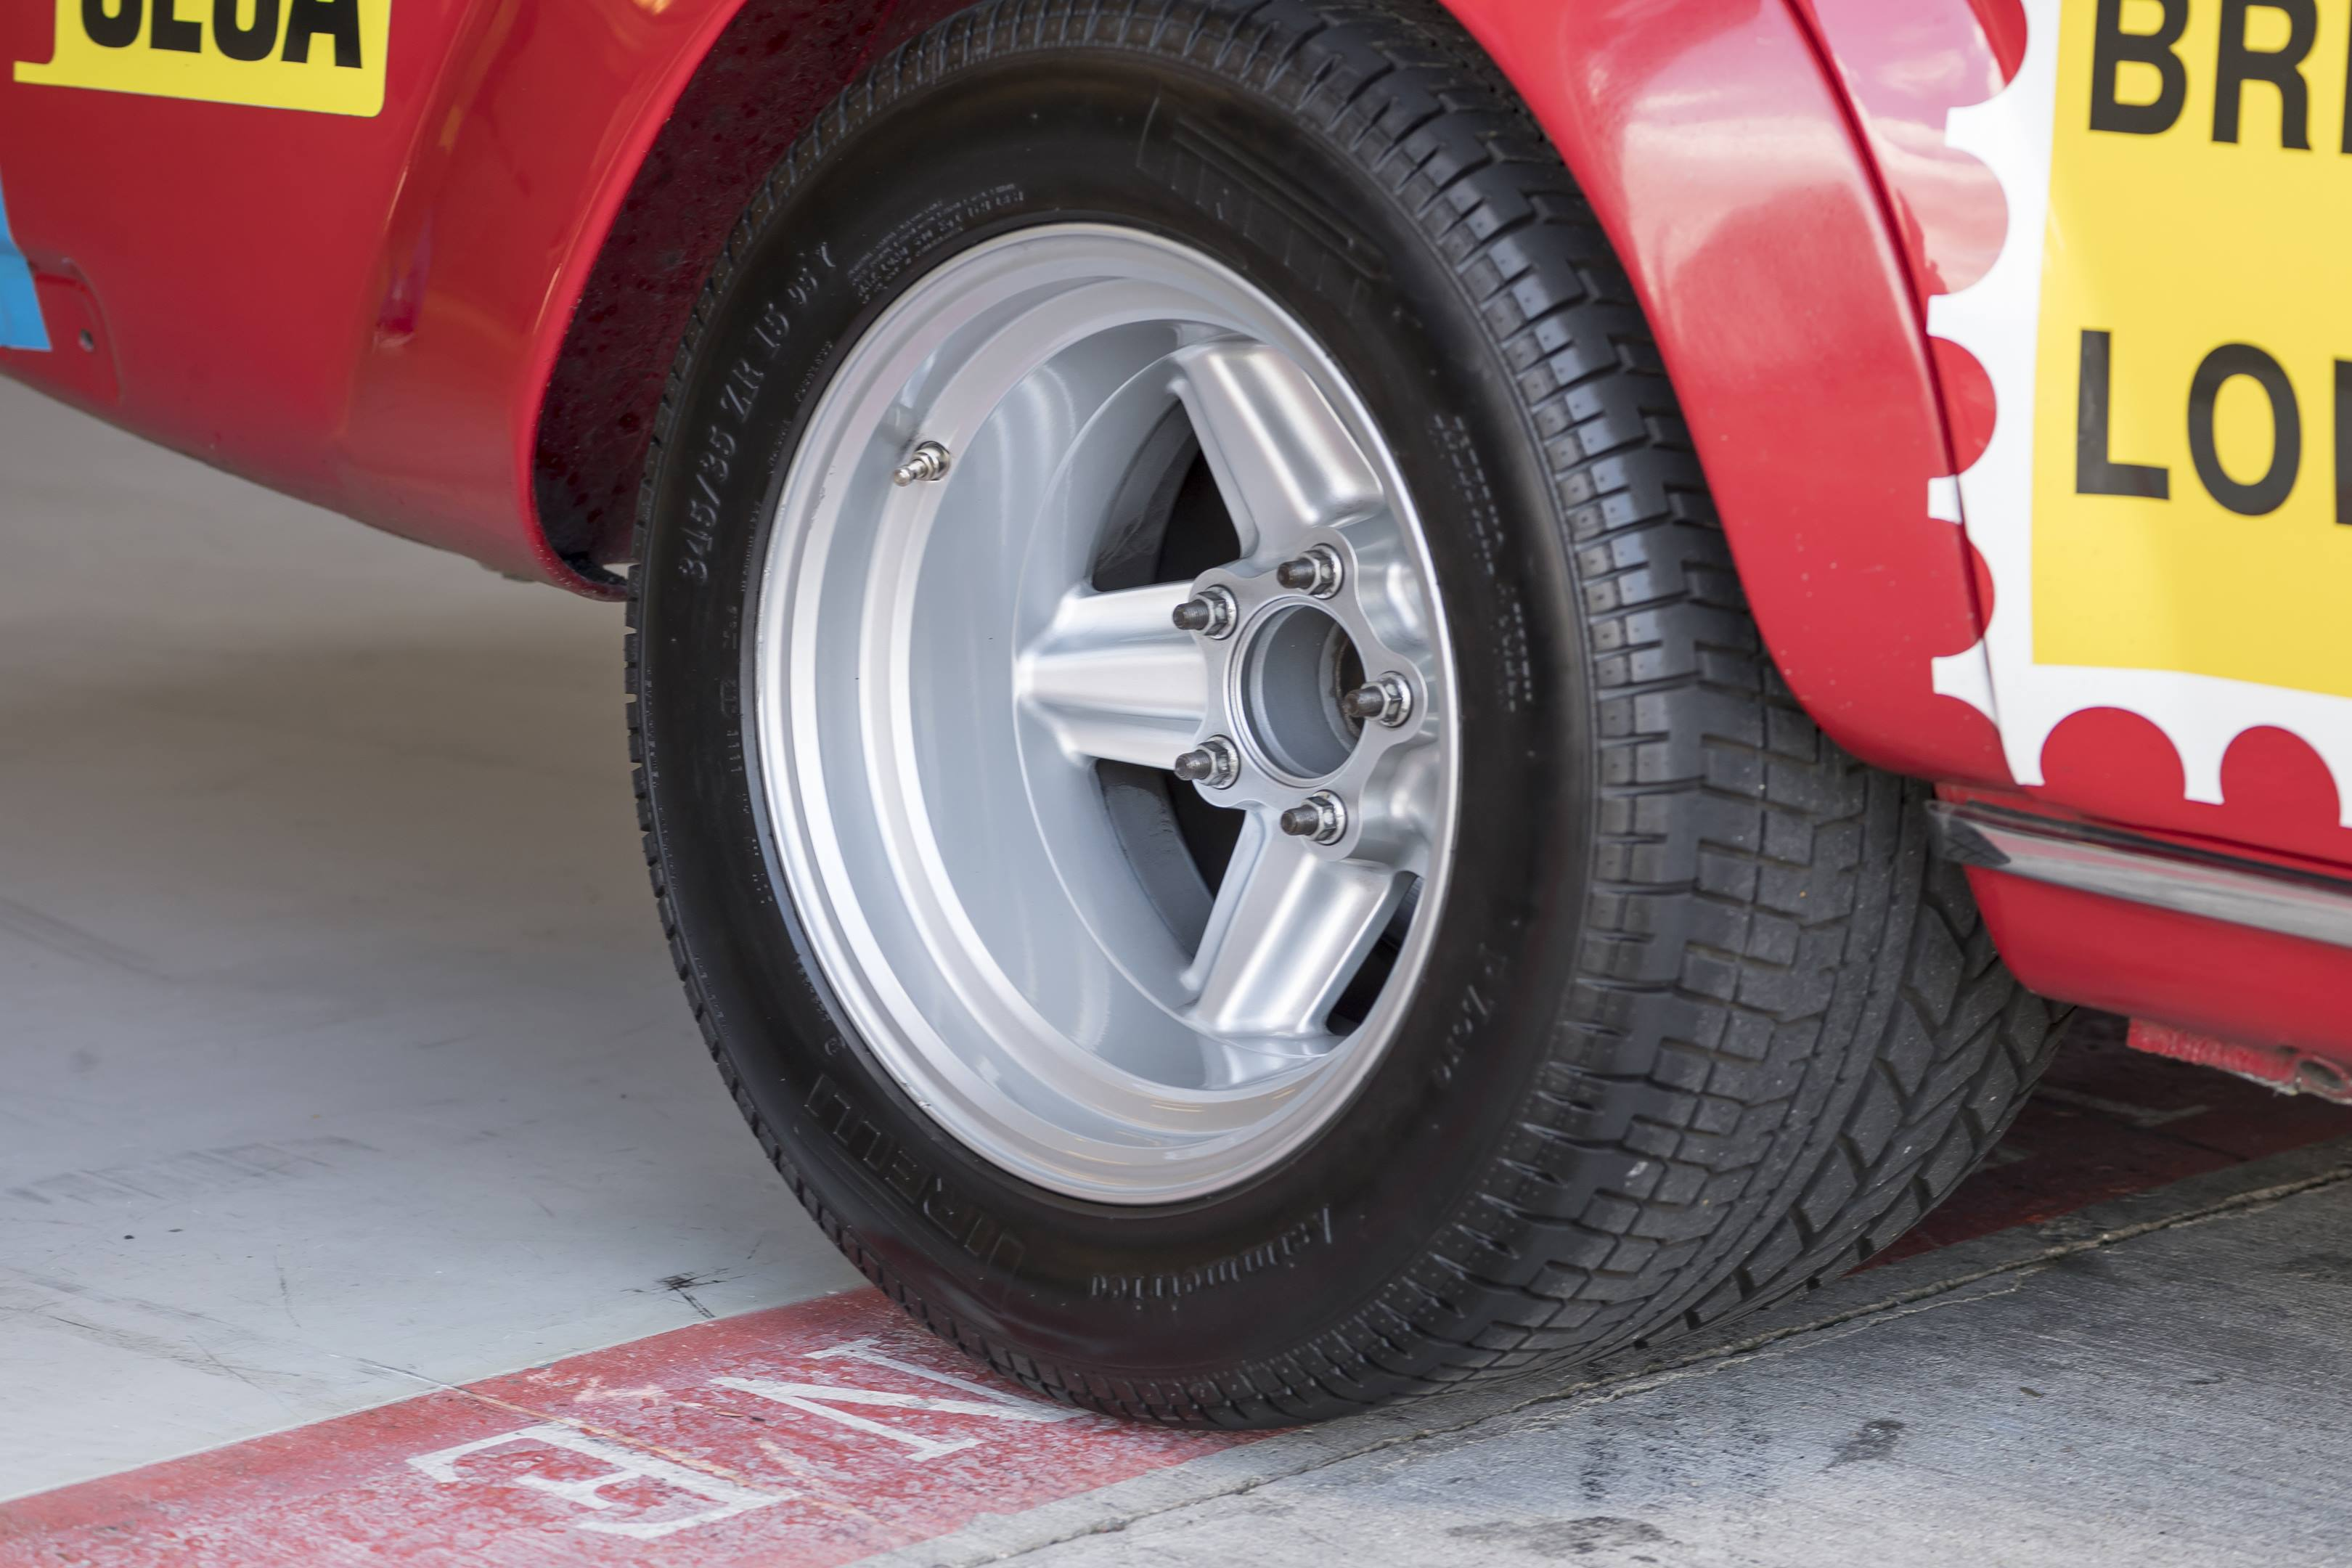 mercedes benz amg 300SEL 6.3 rear tire